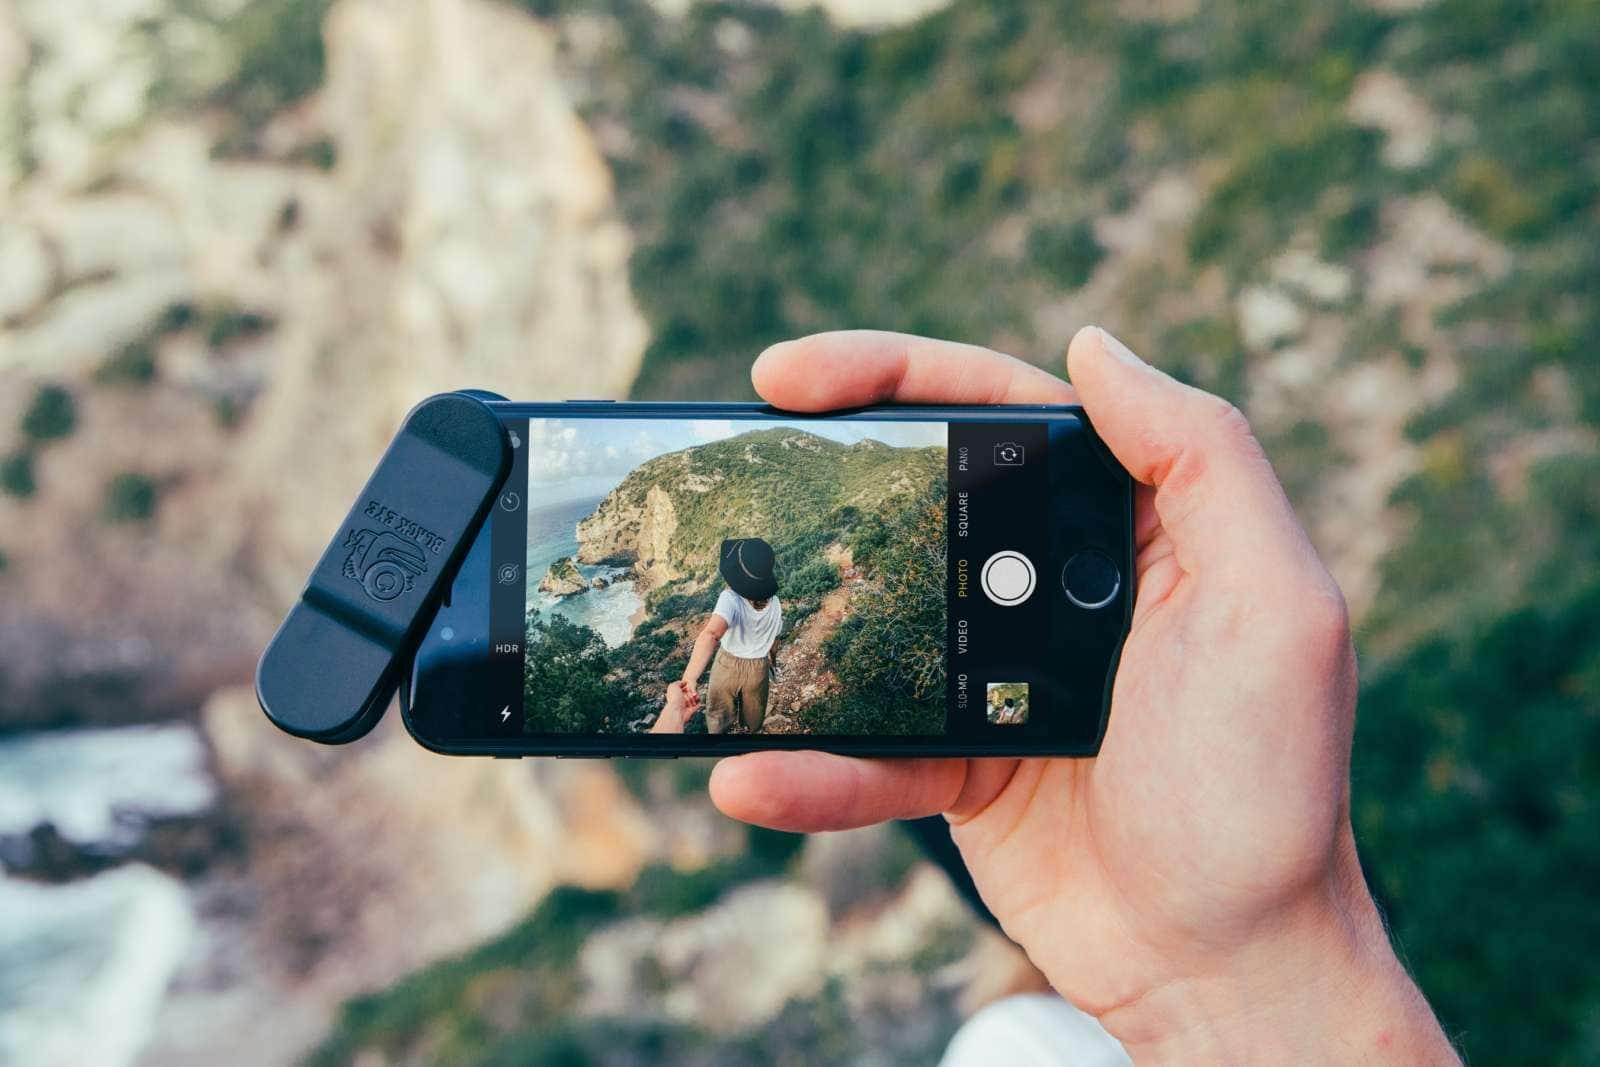 iPhone met een Black Eye Cinema Wide lens